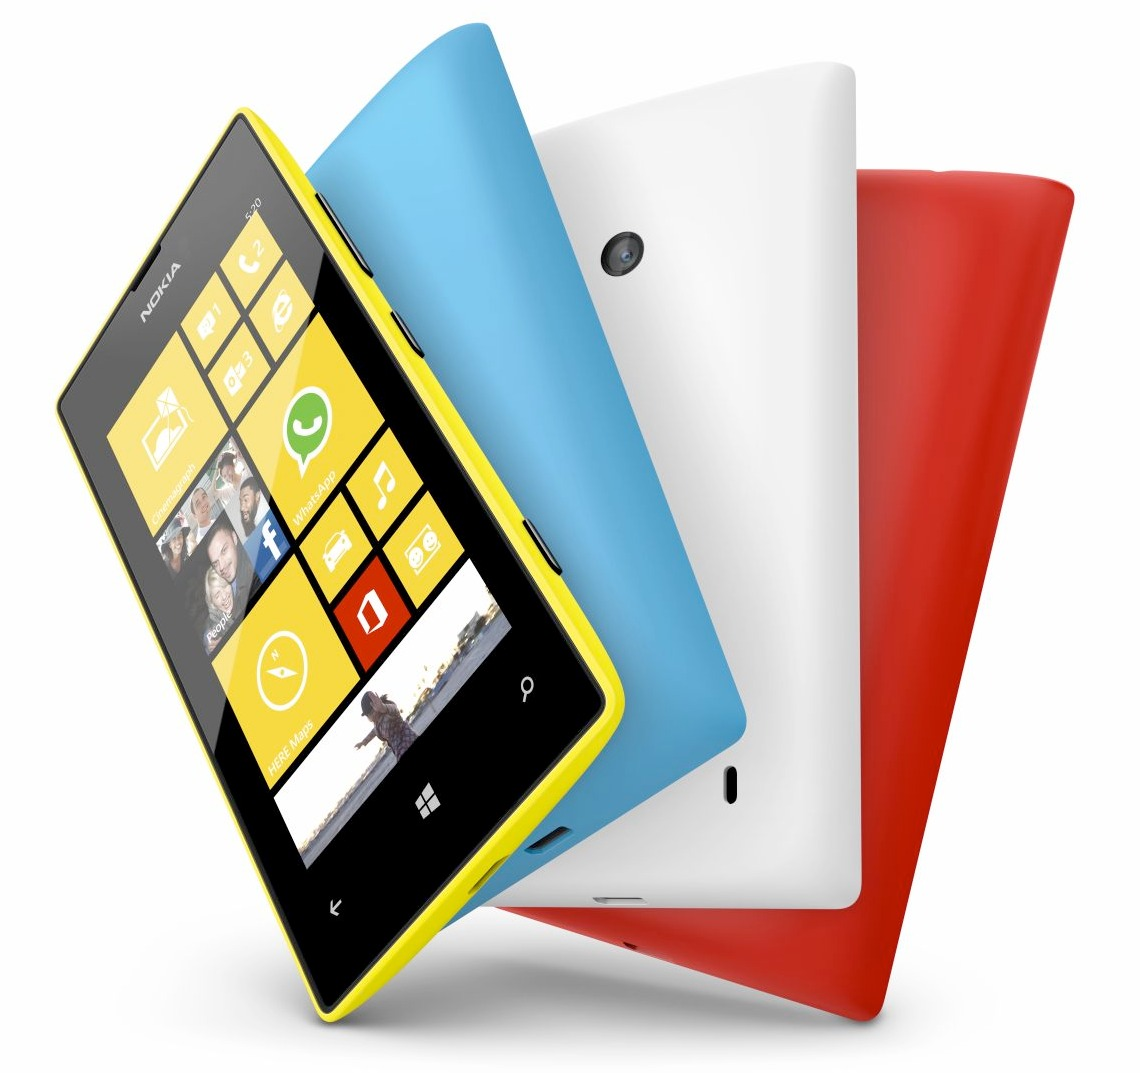 Como baixar e instalar aplicativos no Nokia Lumia 520?